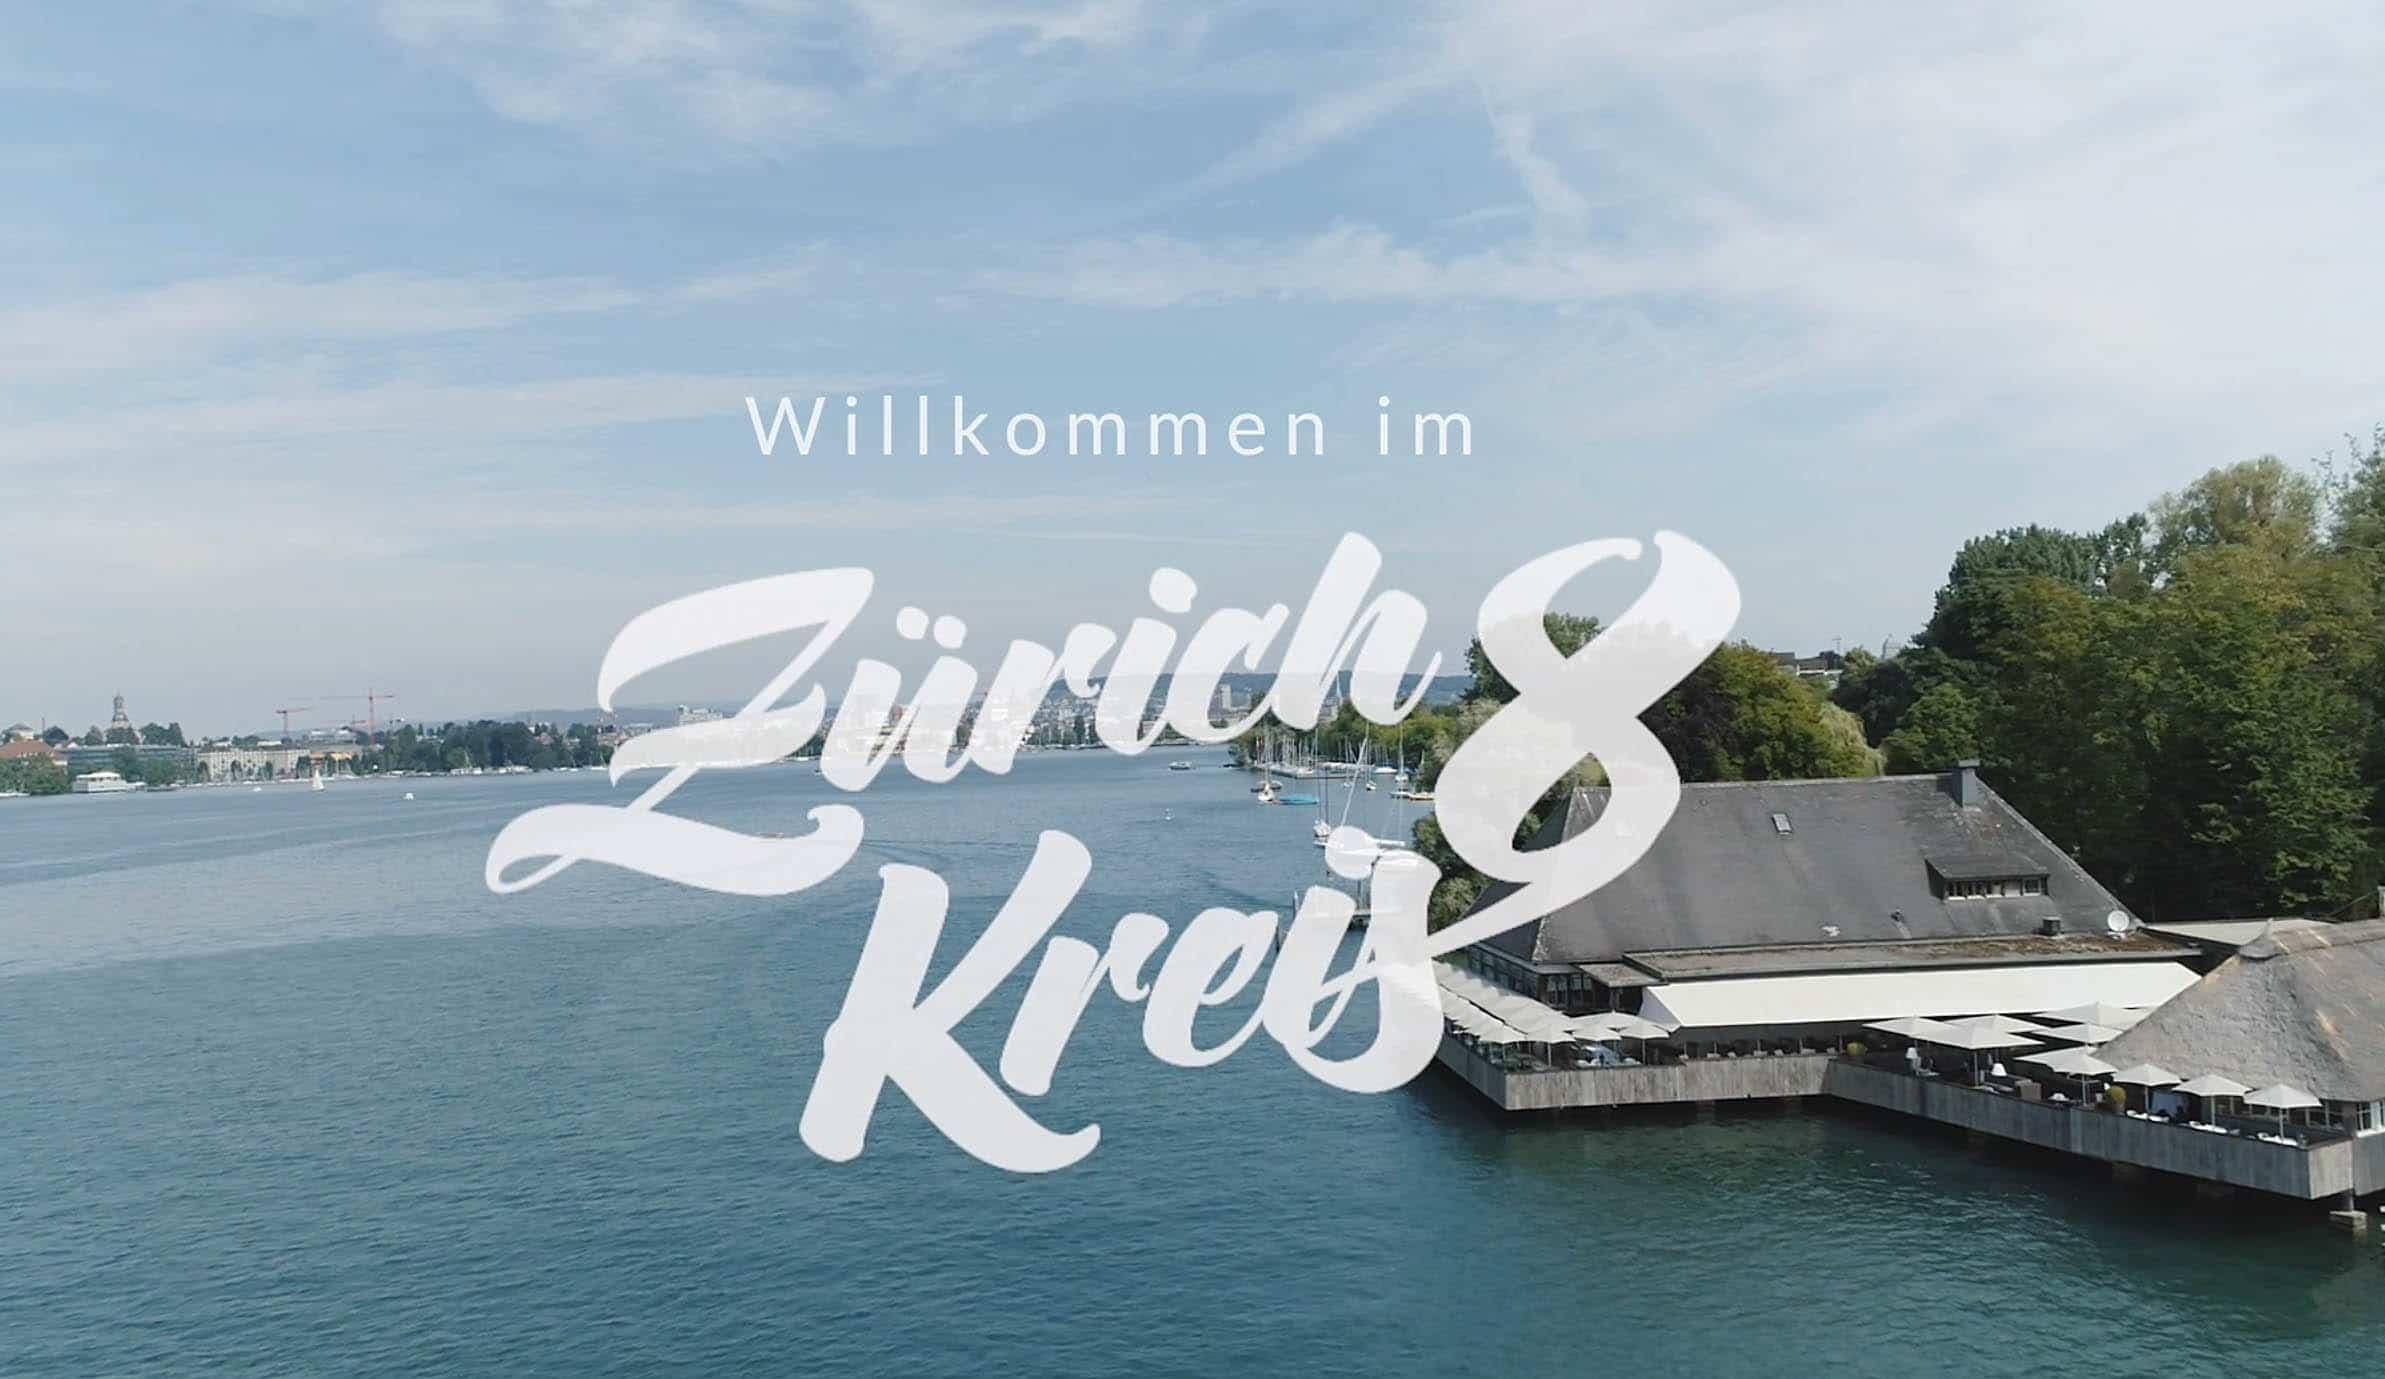 Zürich Kreis 8